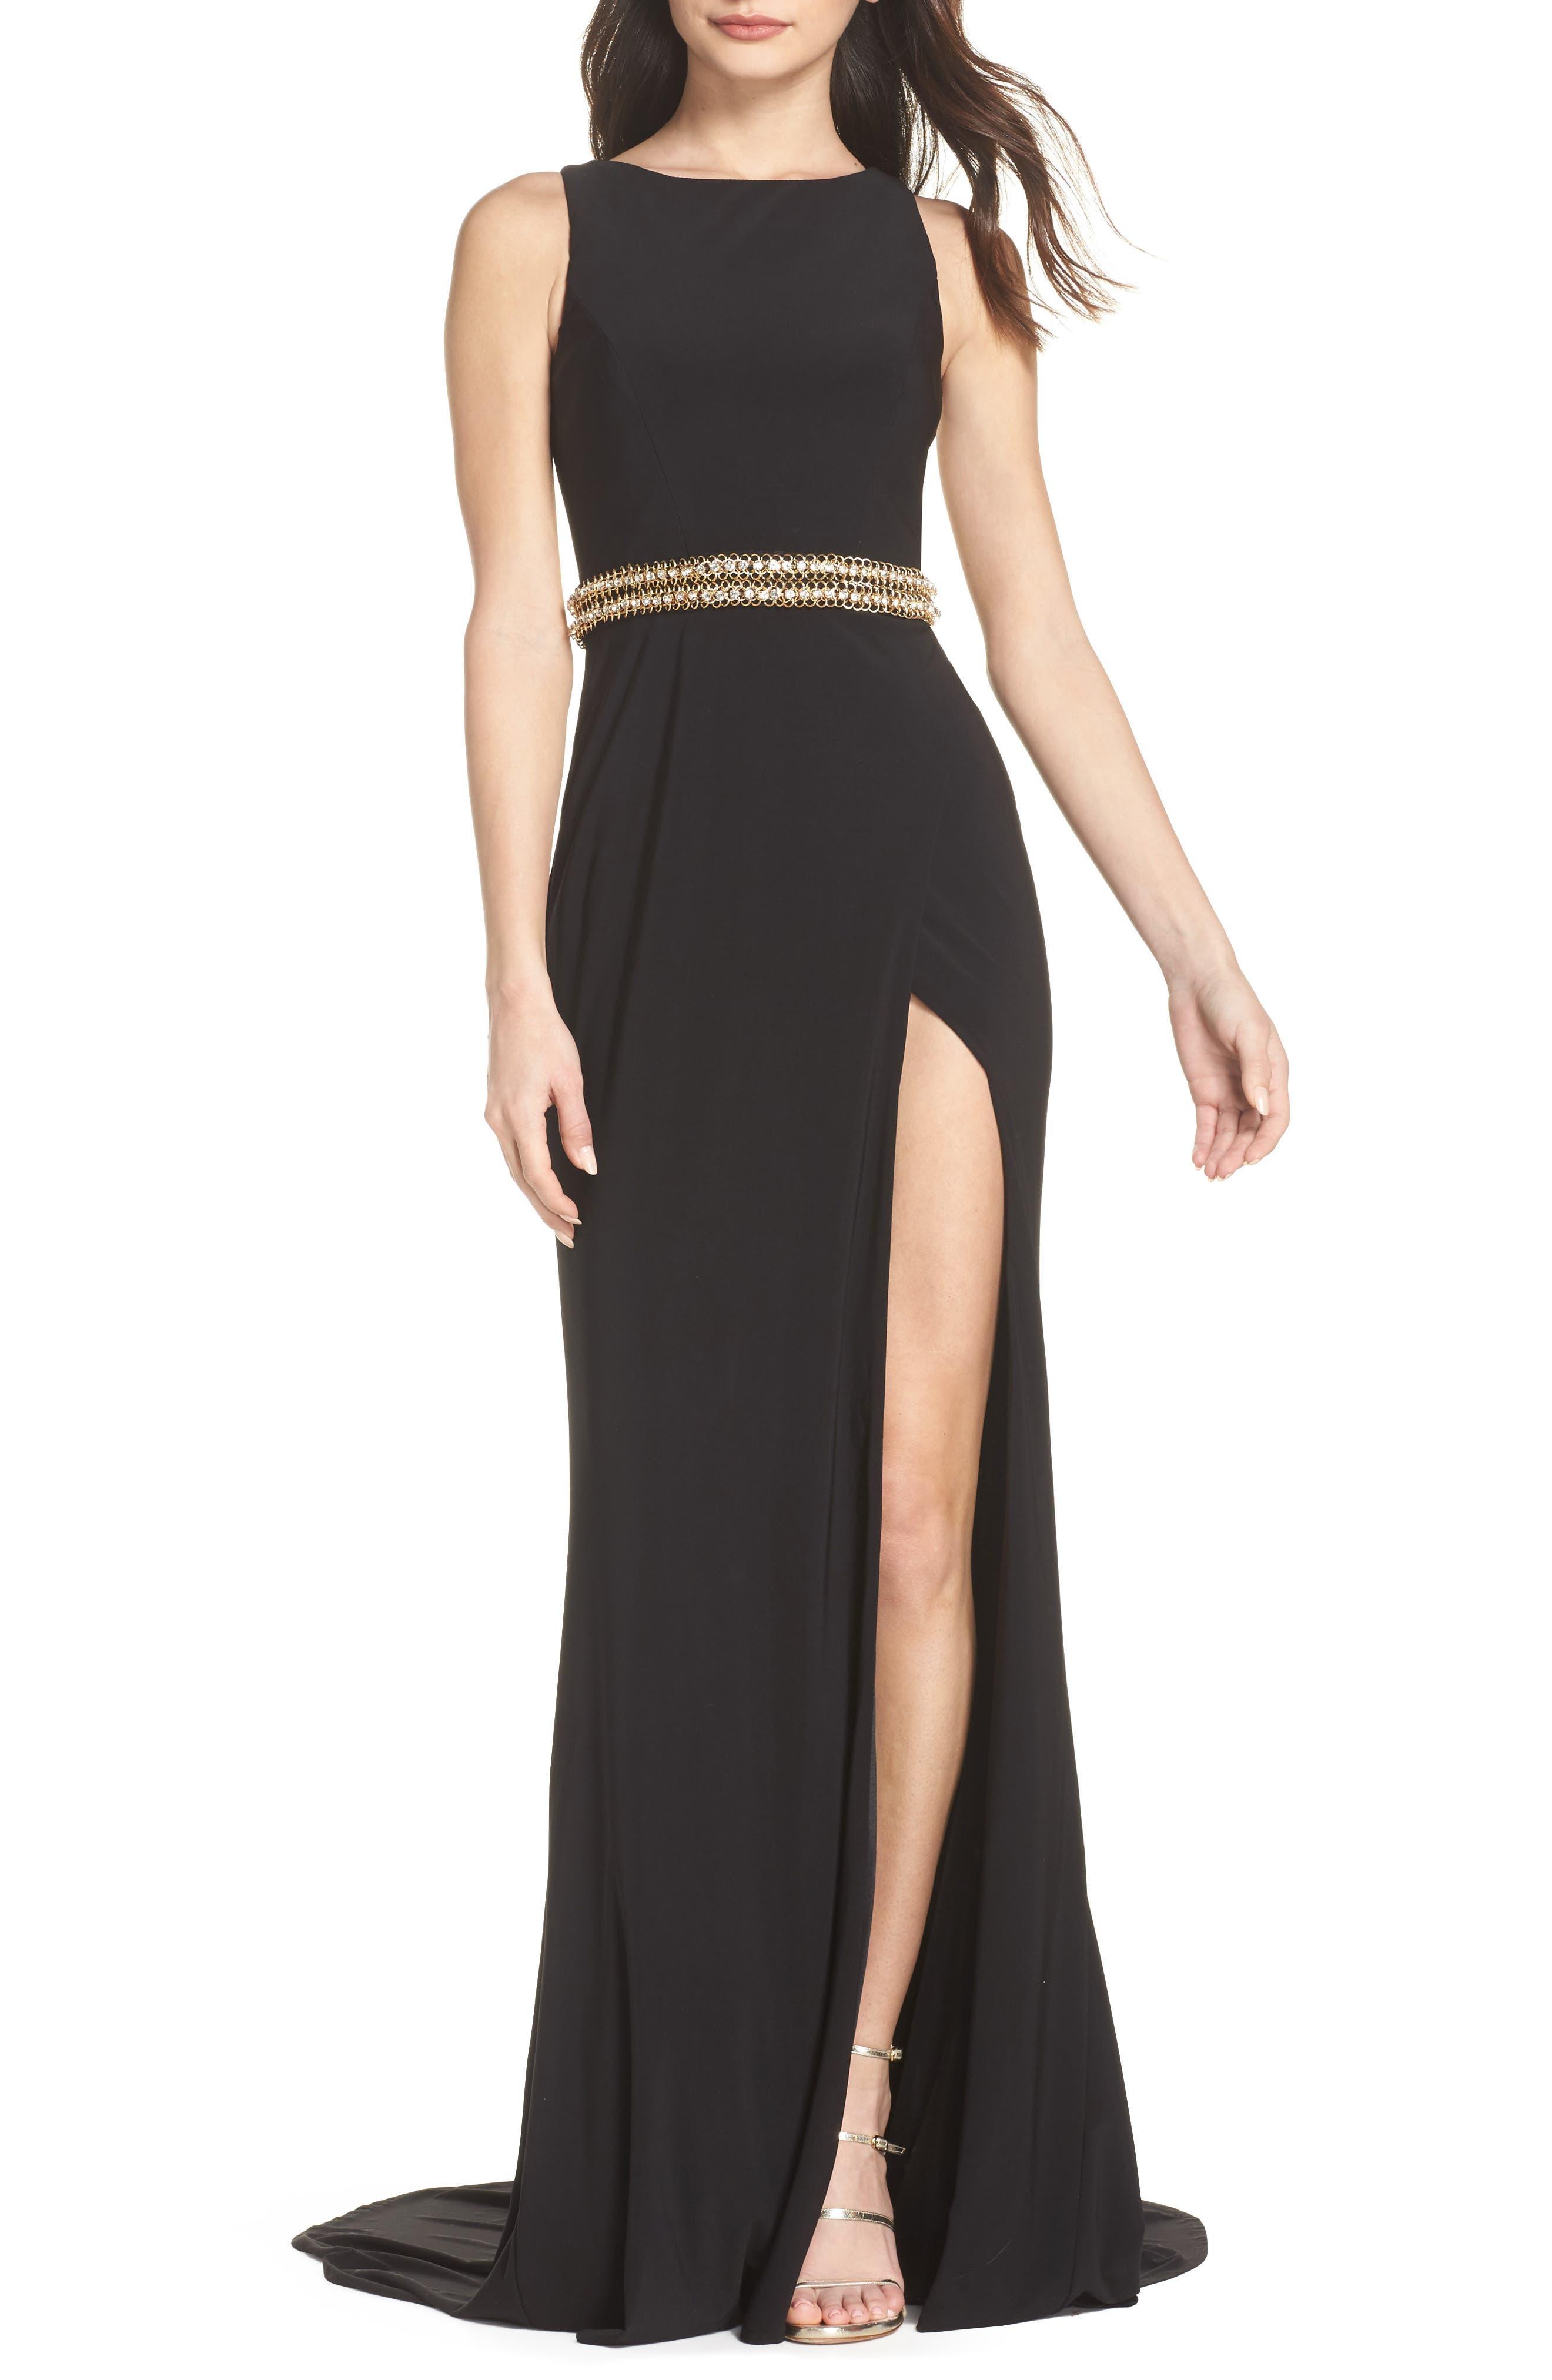 MAC DUGGAL, Embellished Waist Gown, Main thumbnail 1, color, BLACK